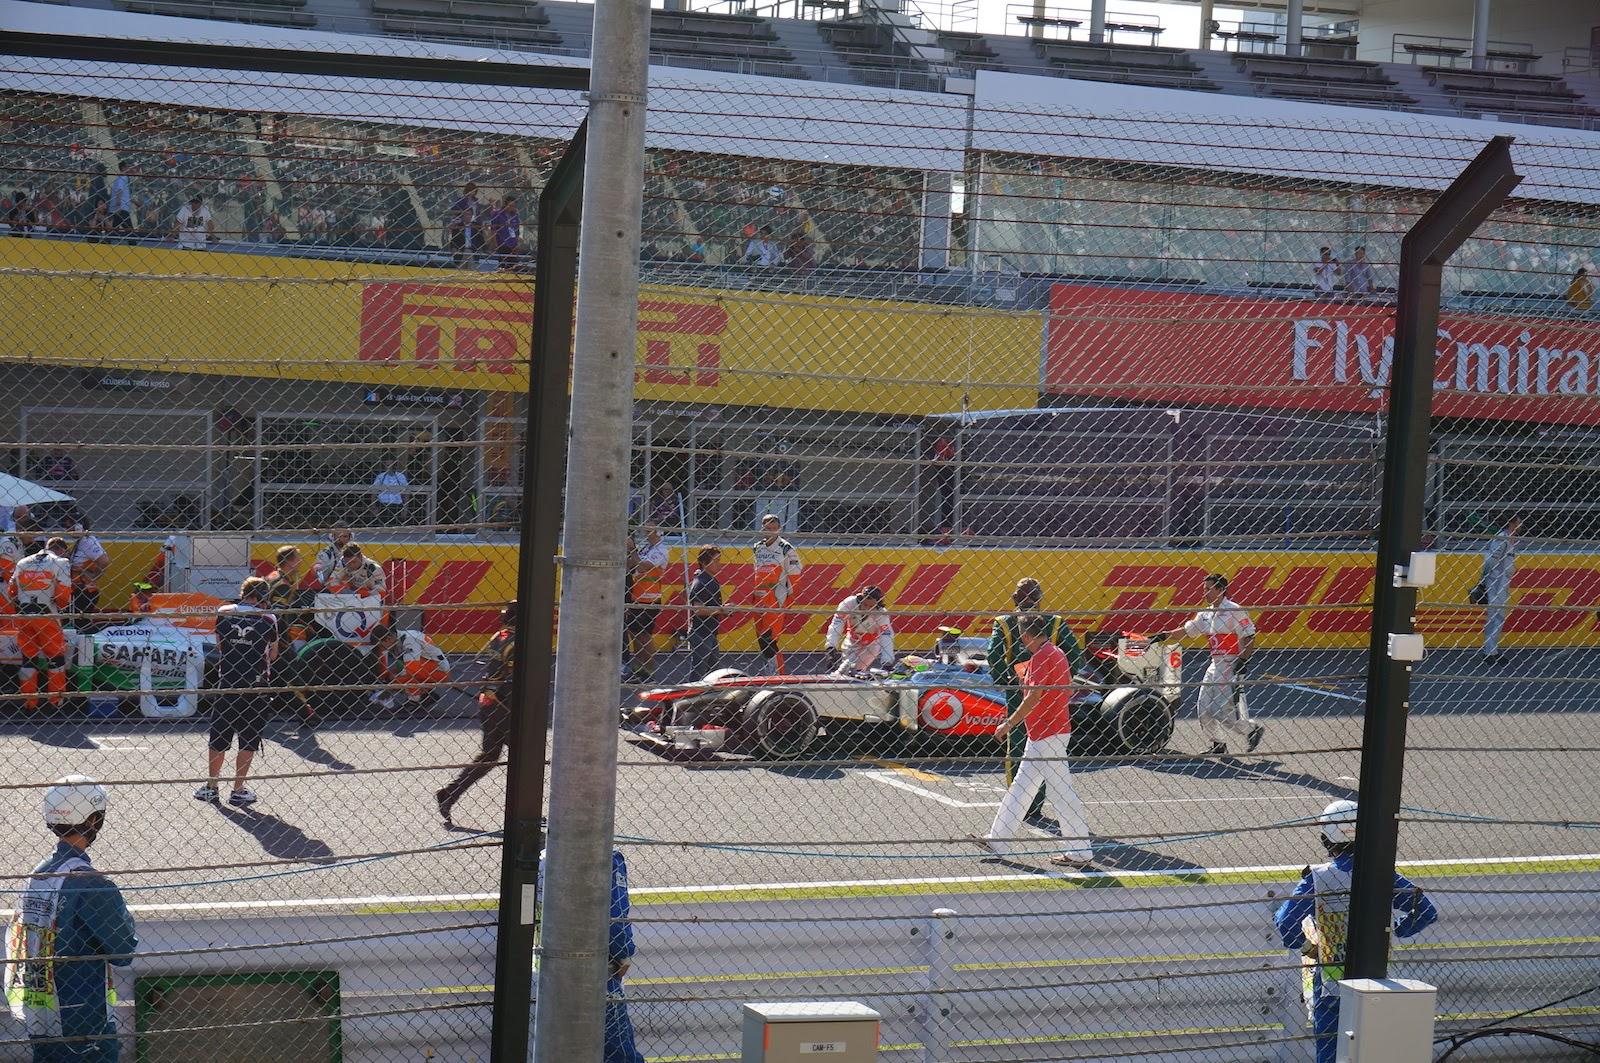 2013 FIA F1世界選手権 第15戦 日本グランプリ3(2日目・決勝)